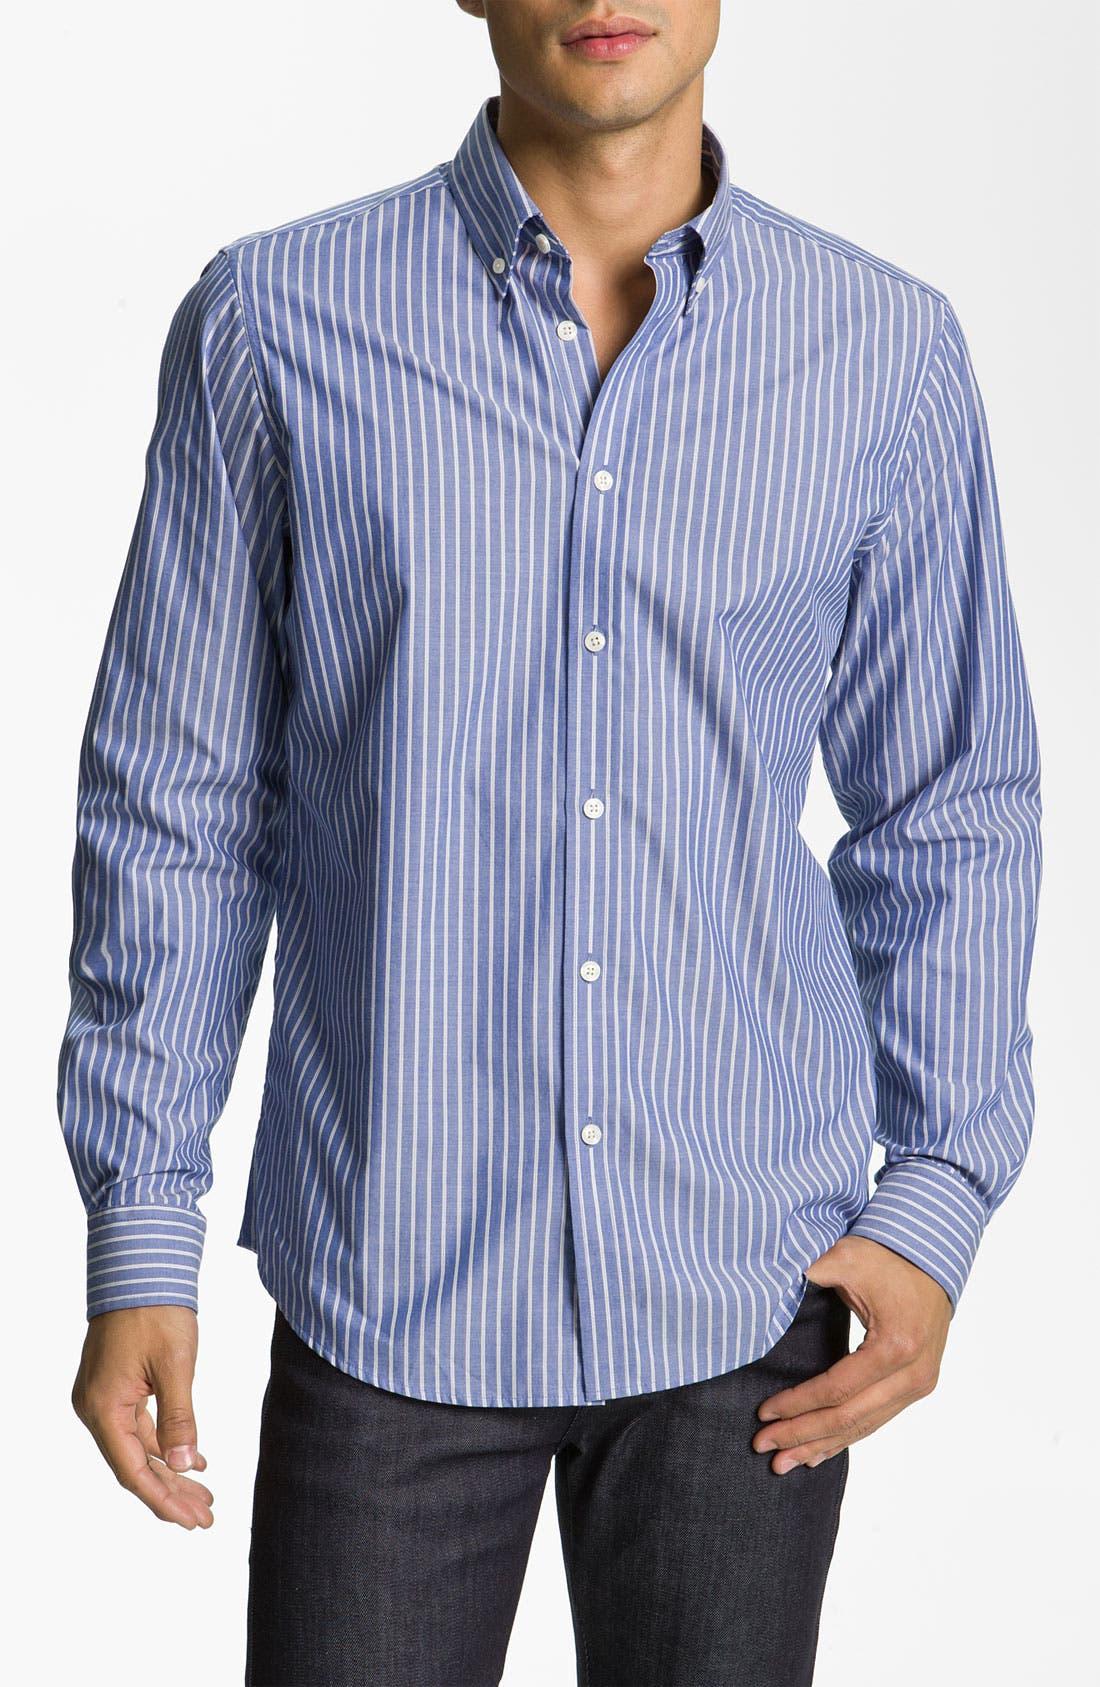 Alternate Image 1 Selected - Ben Sherman 'Clerkenwell' Stripe Woven Shirt